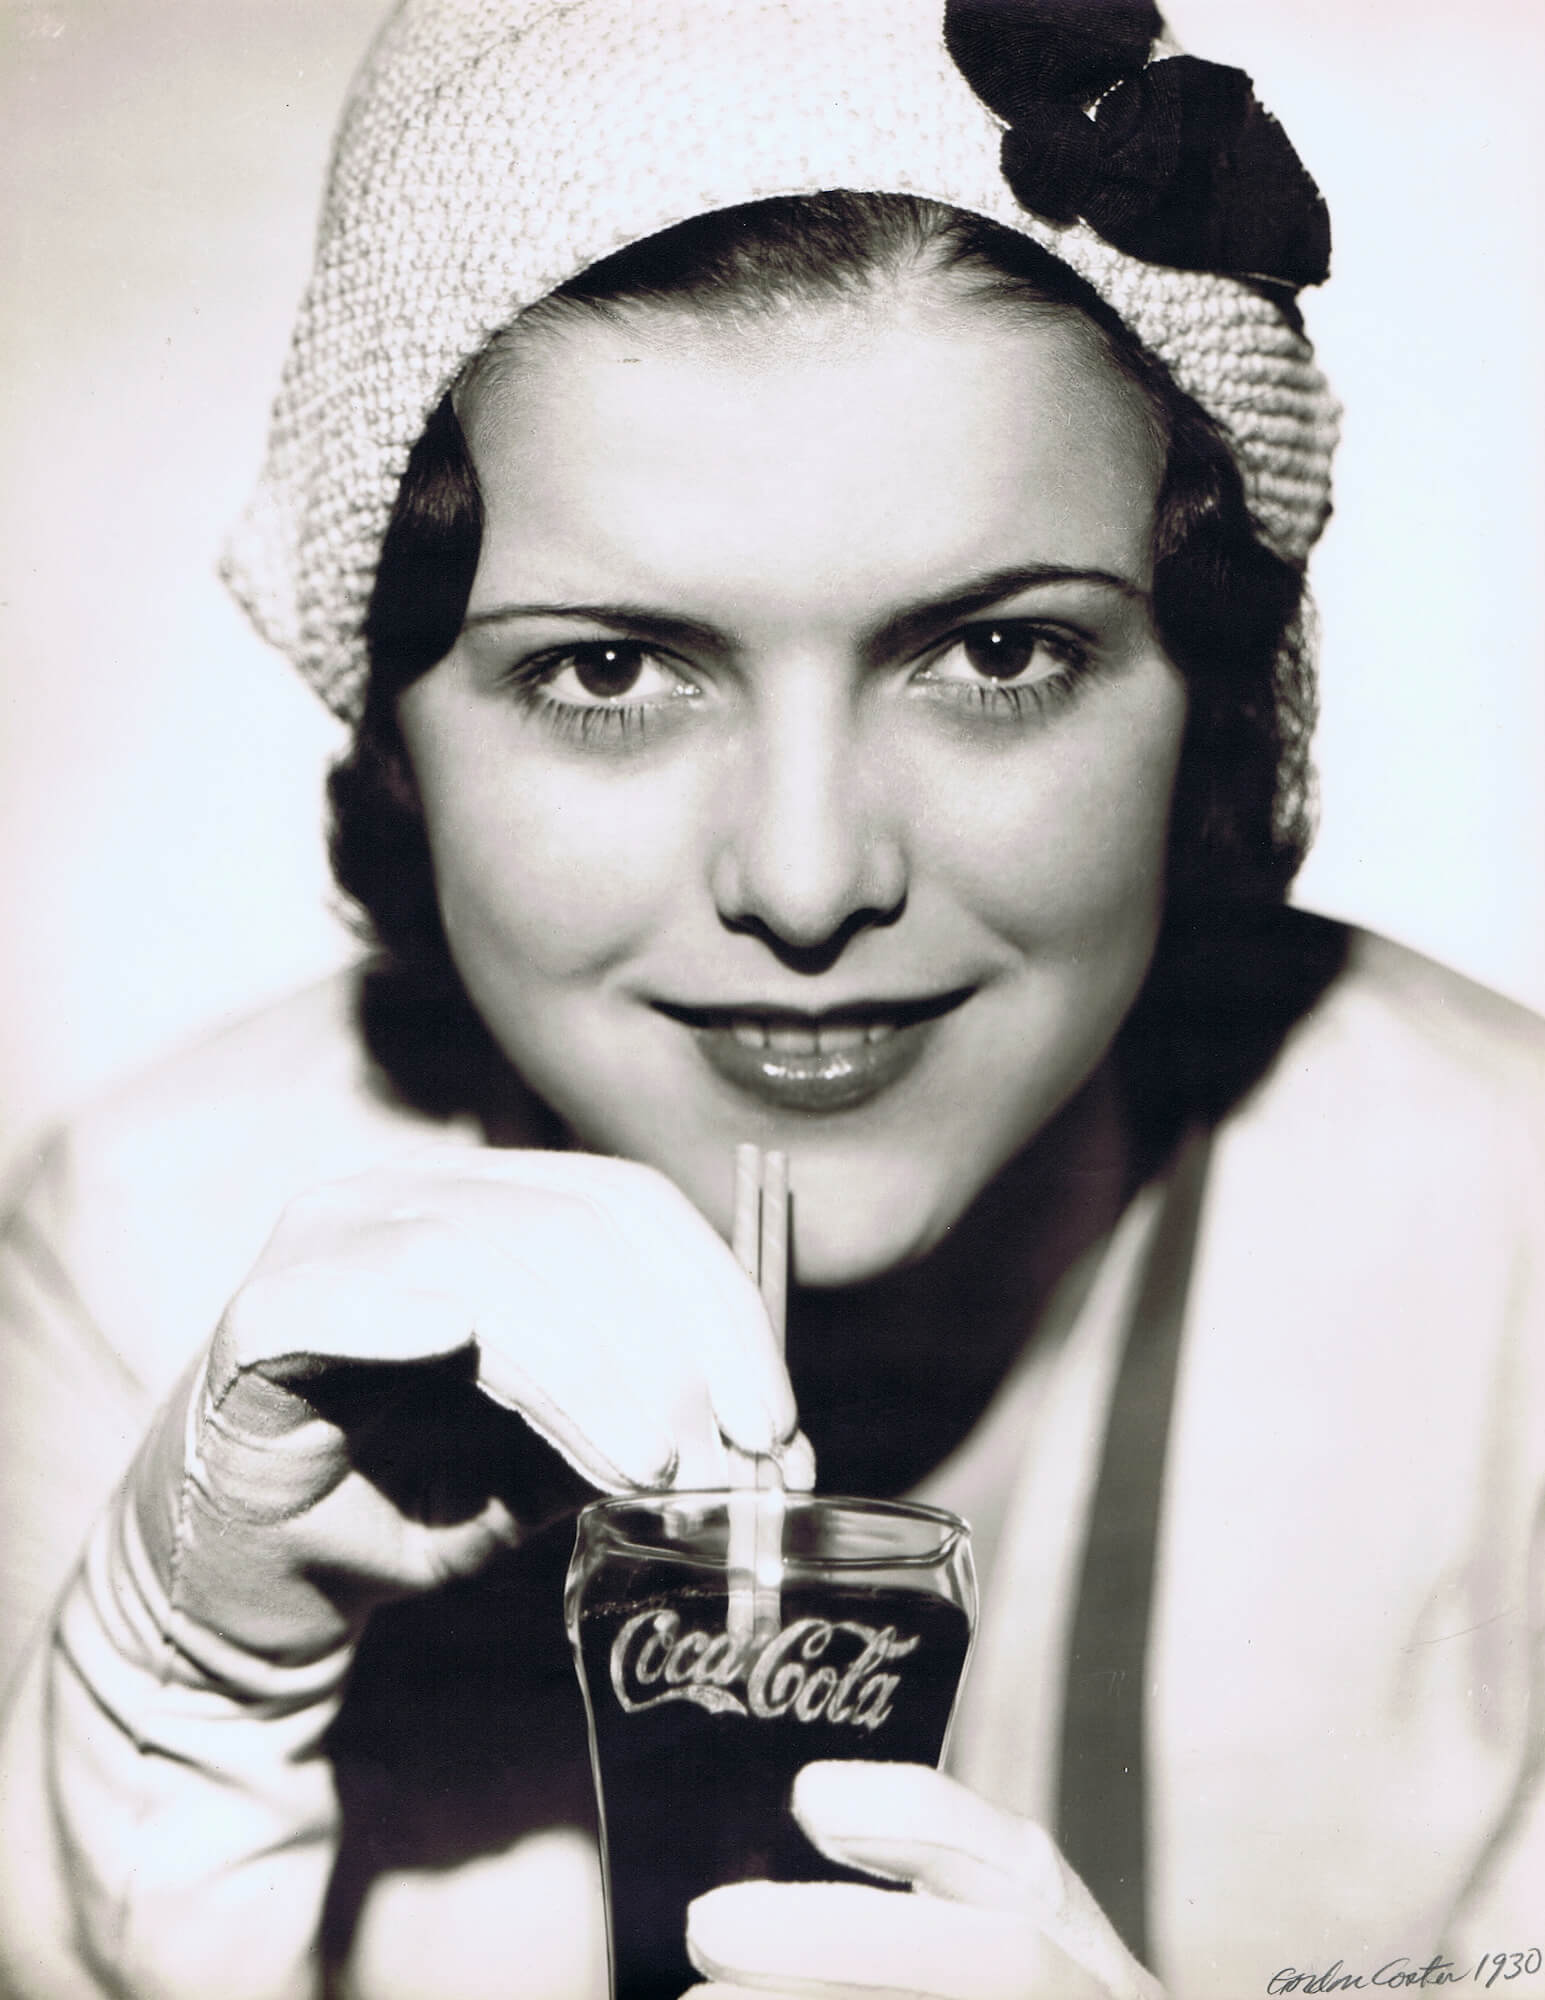 Coca Cola Advertisement, 1930